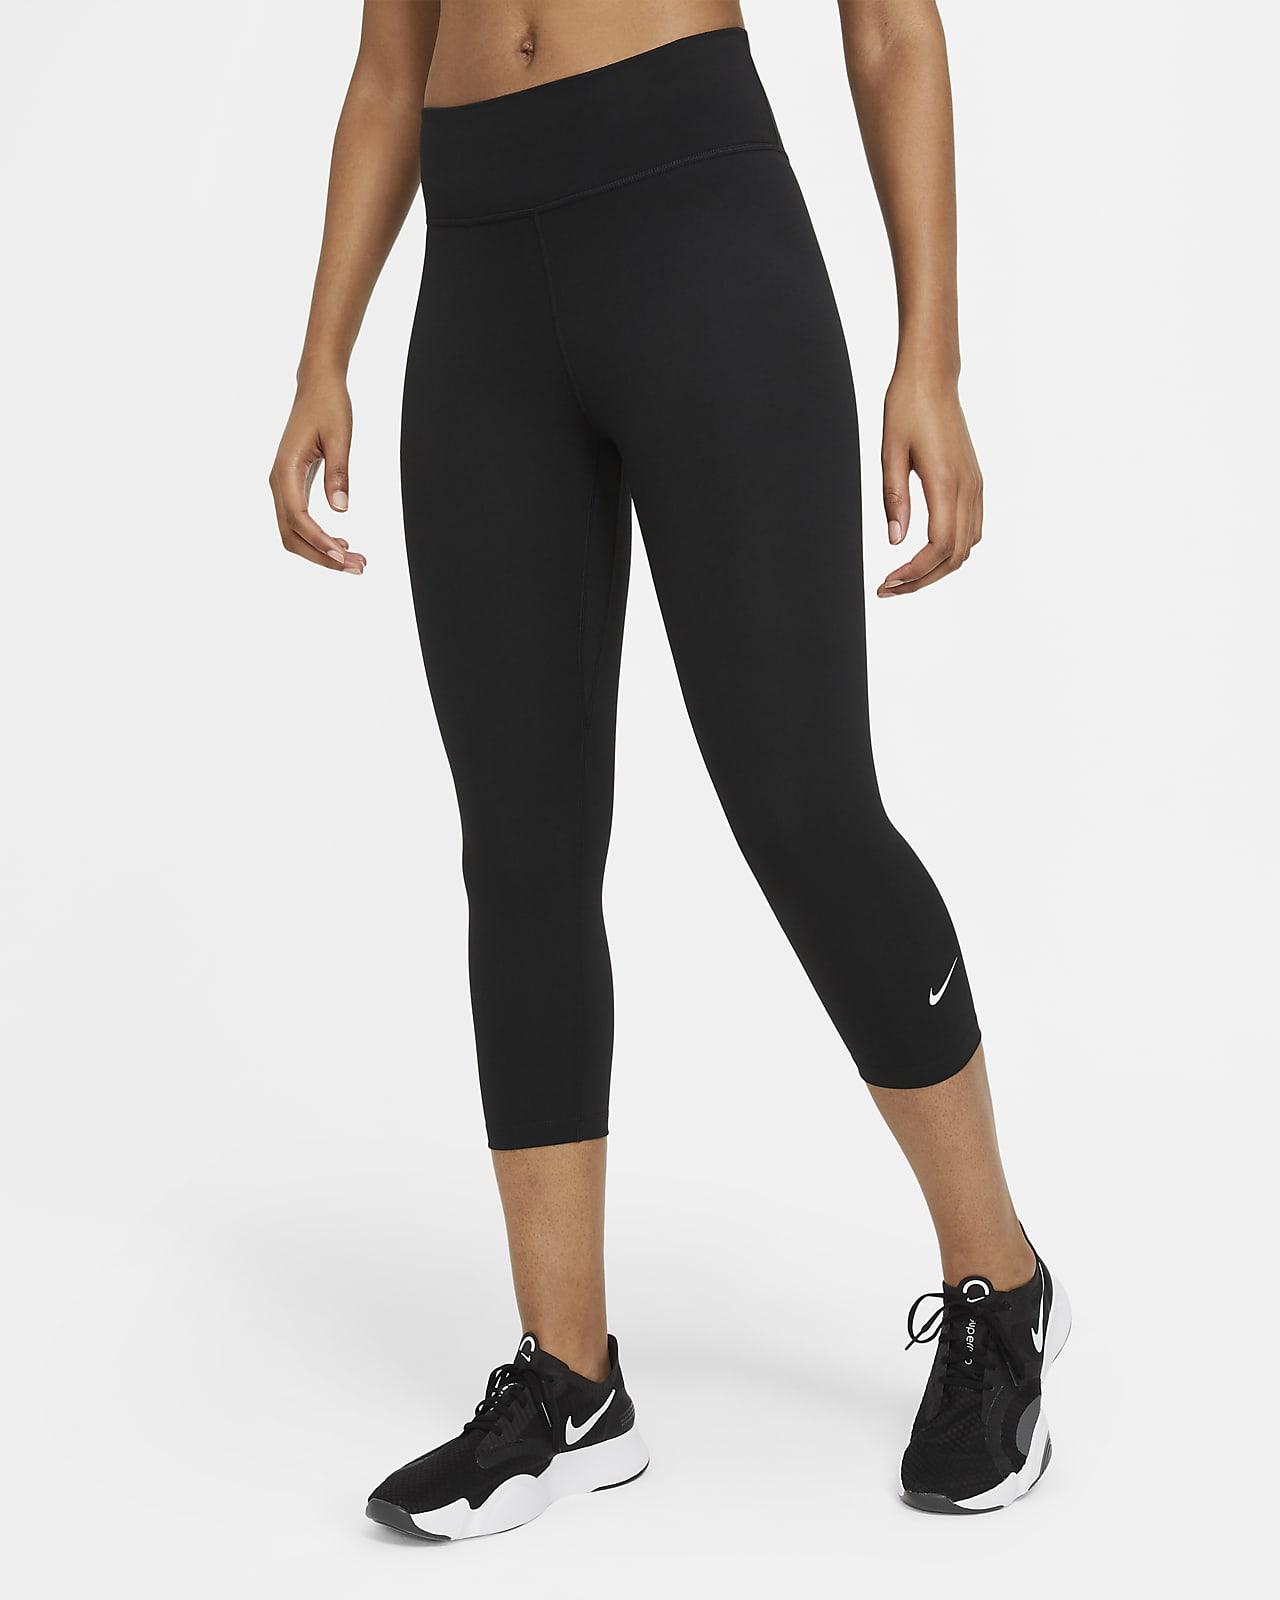 Nike One Leggings piratas de talle medio - Mujer